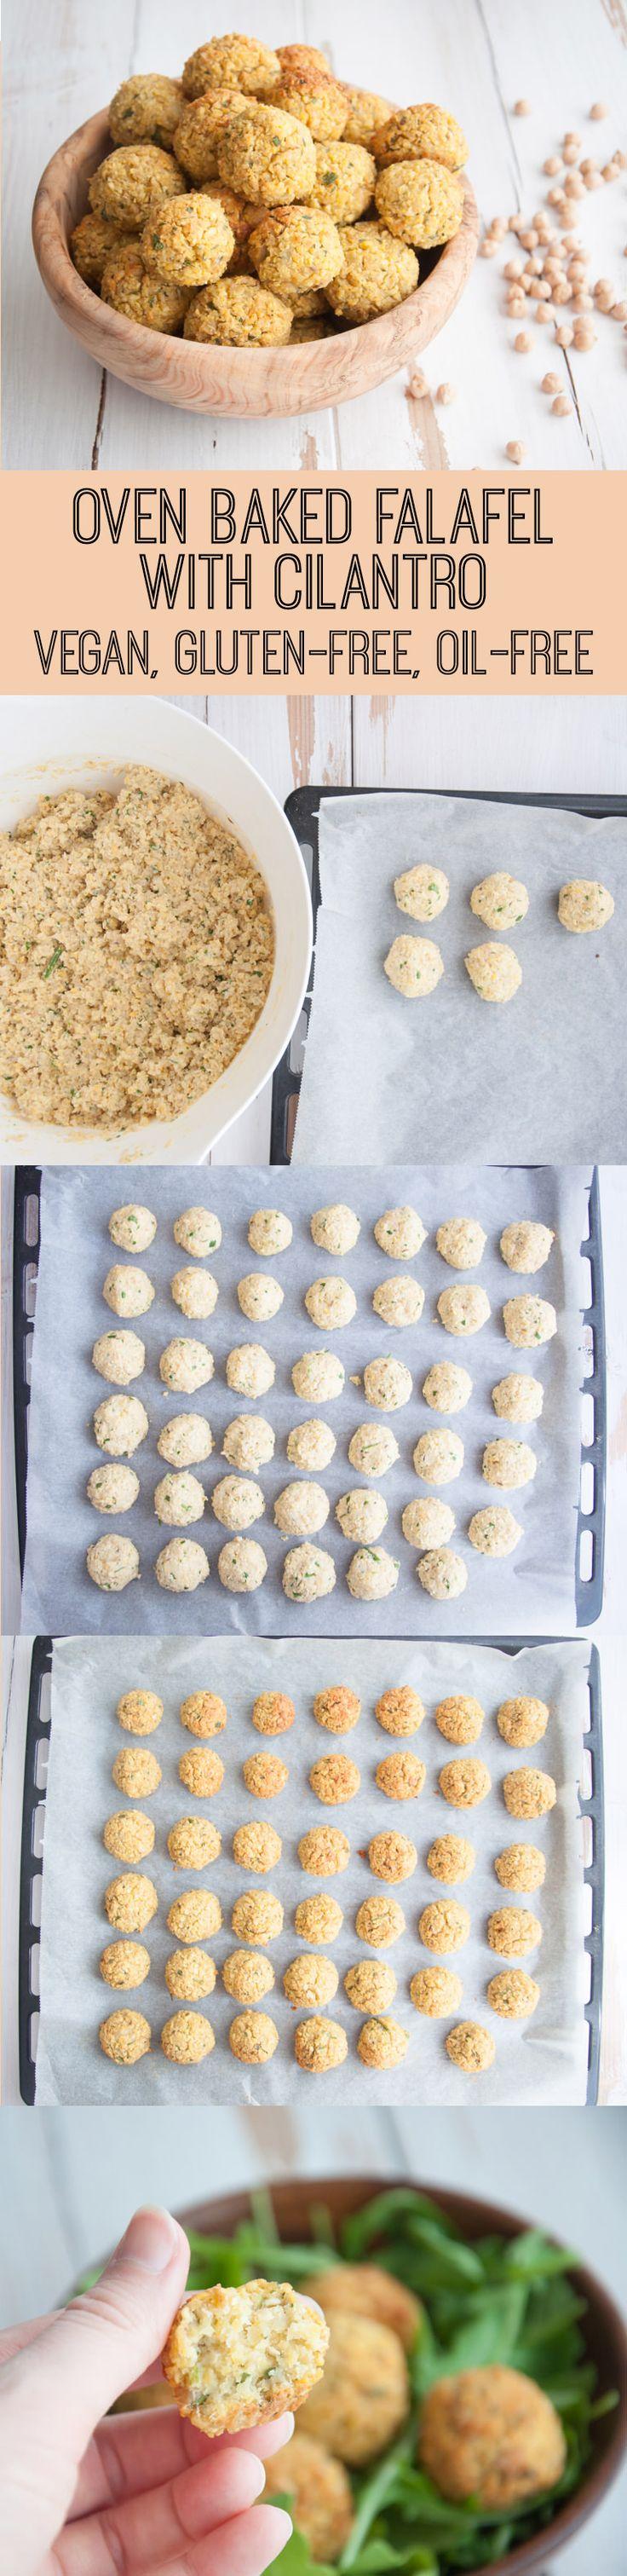 Vegan Oil-Free Oven Baked Falafel with Cilantro #recipe #dinner